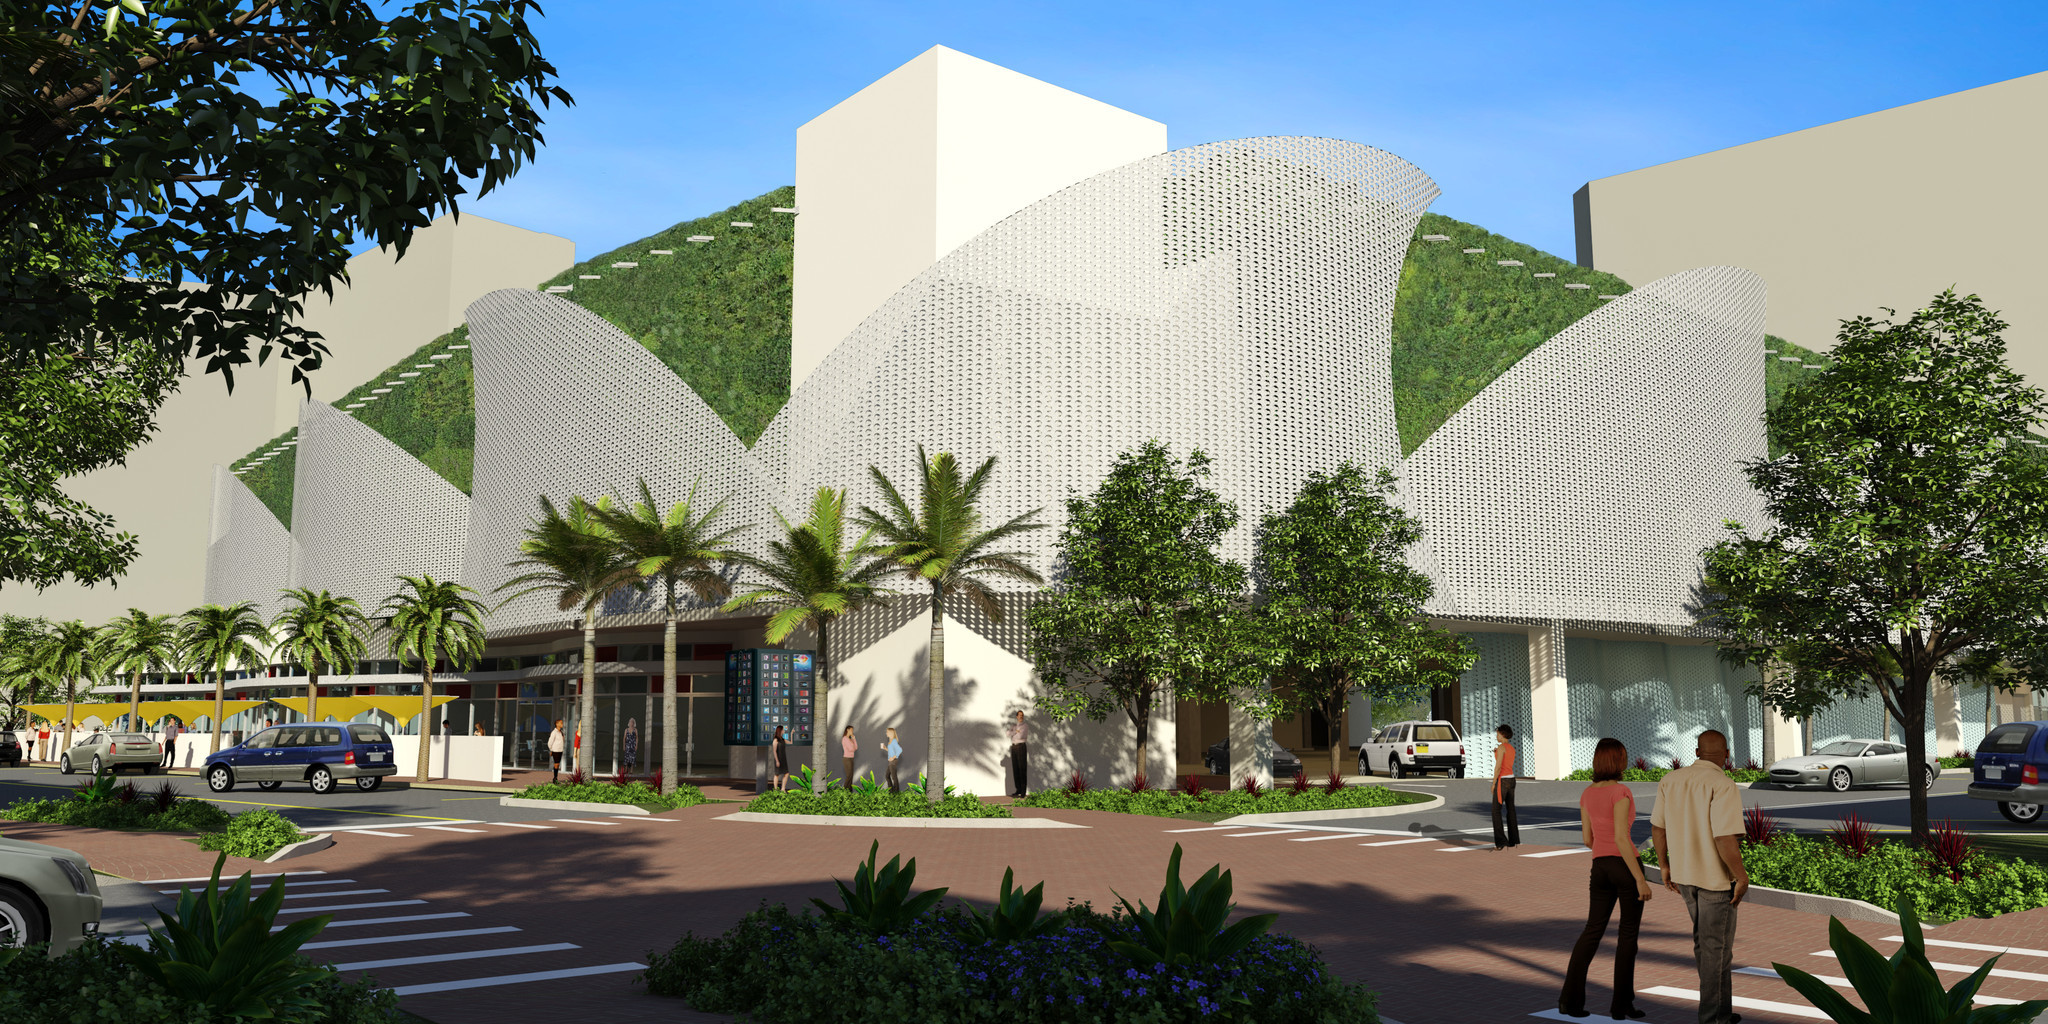 Pompano Beach Plans To Build A 20 Million Parking Garage